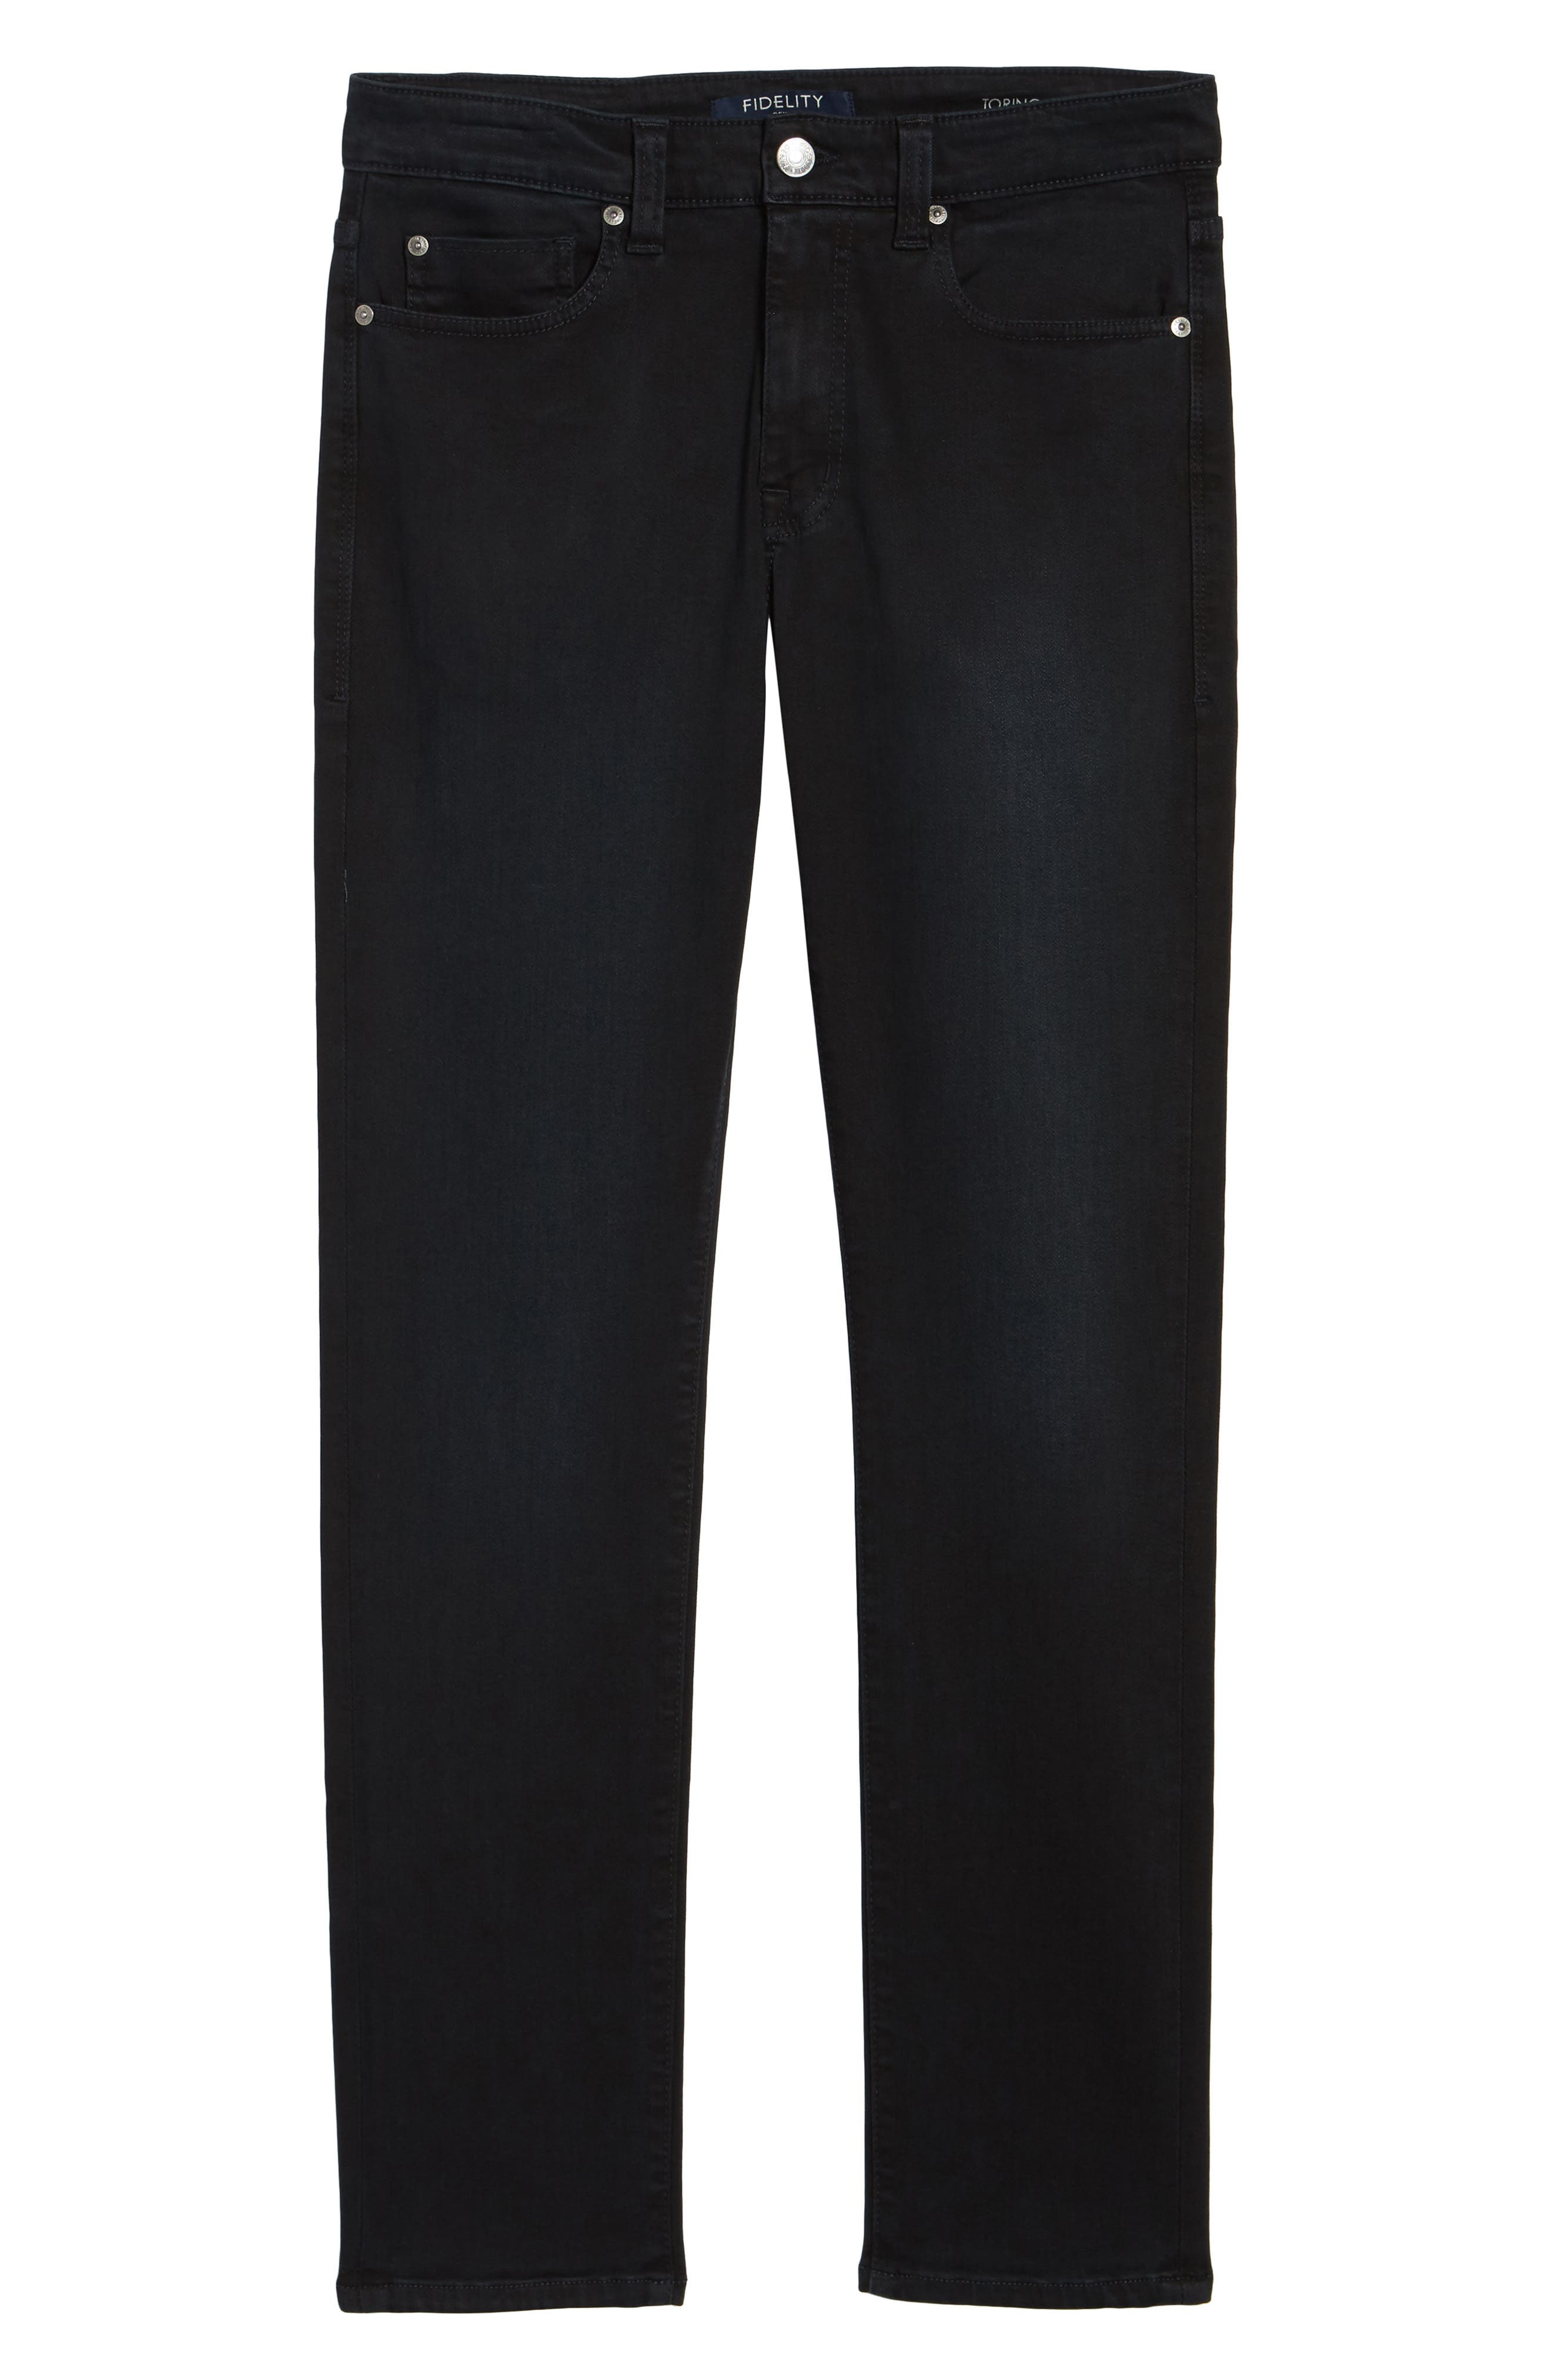 Torino Slim Fit Jeans,                             Alternate thumbnail 6, color,